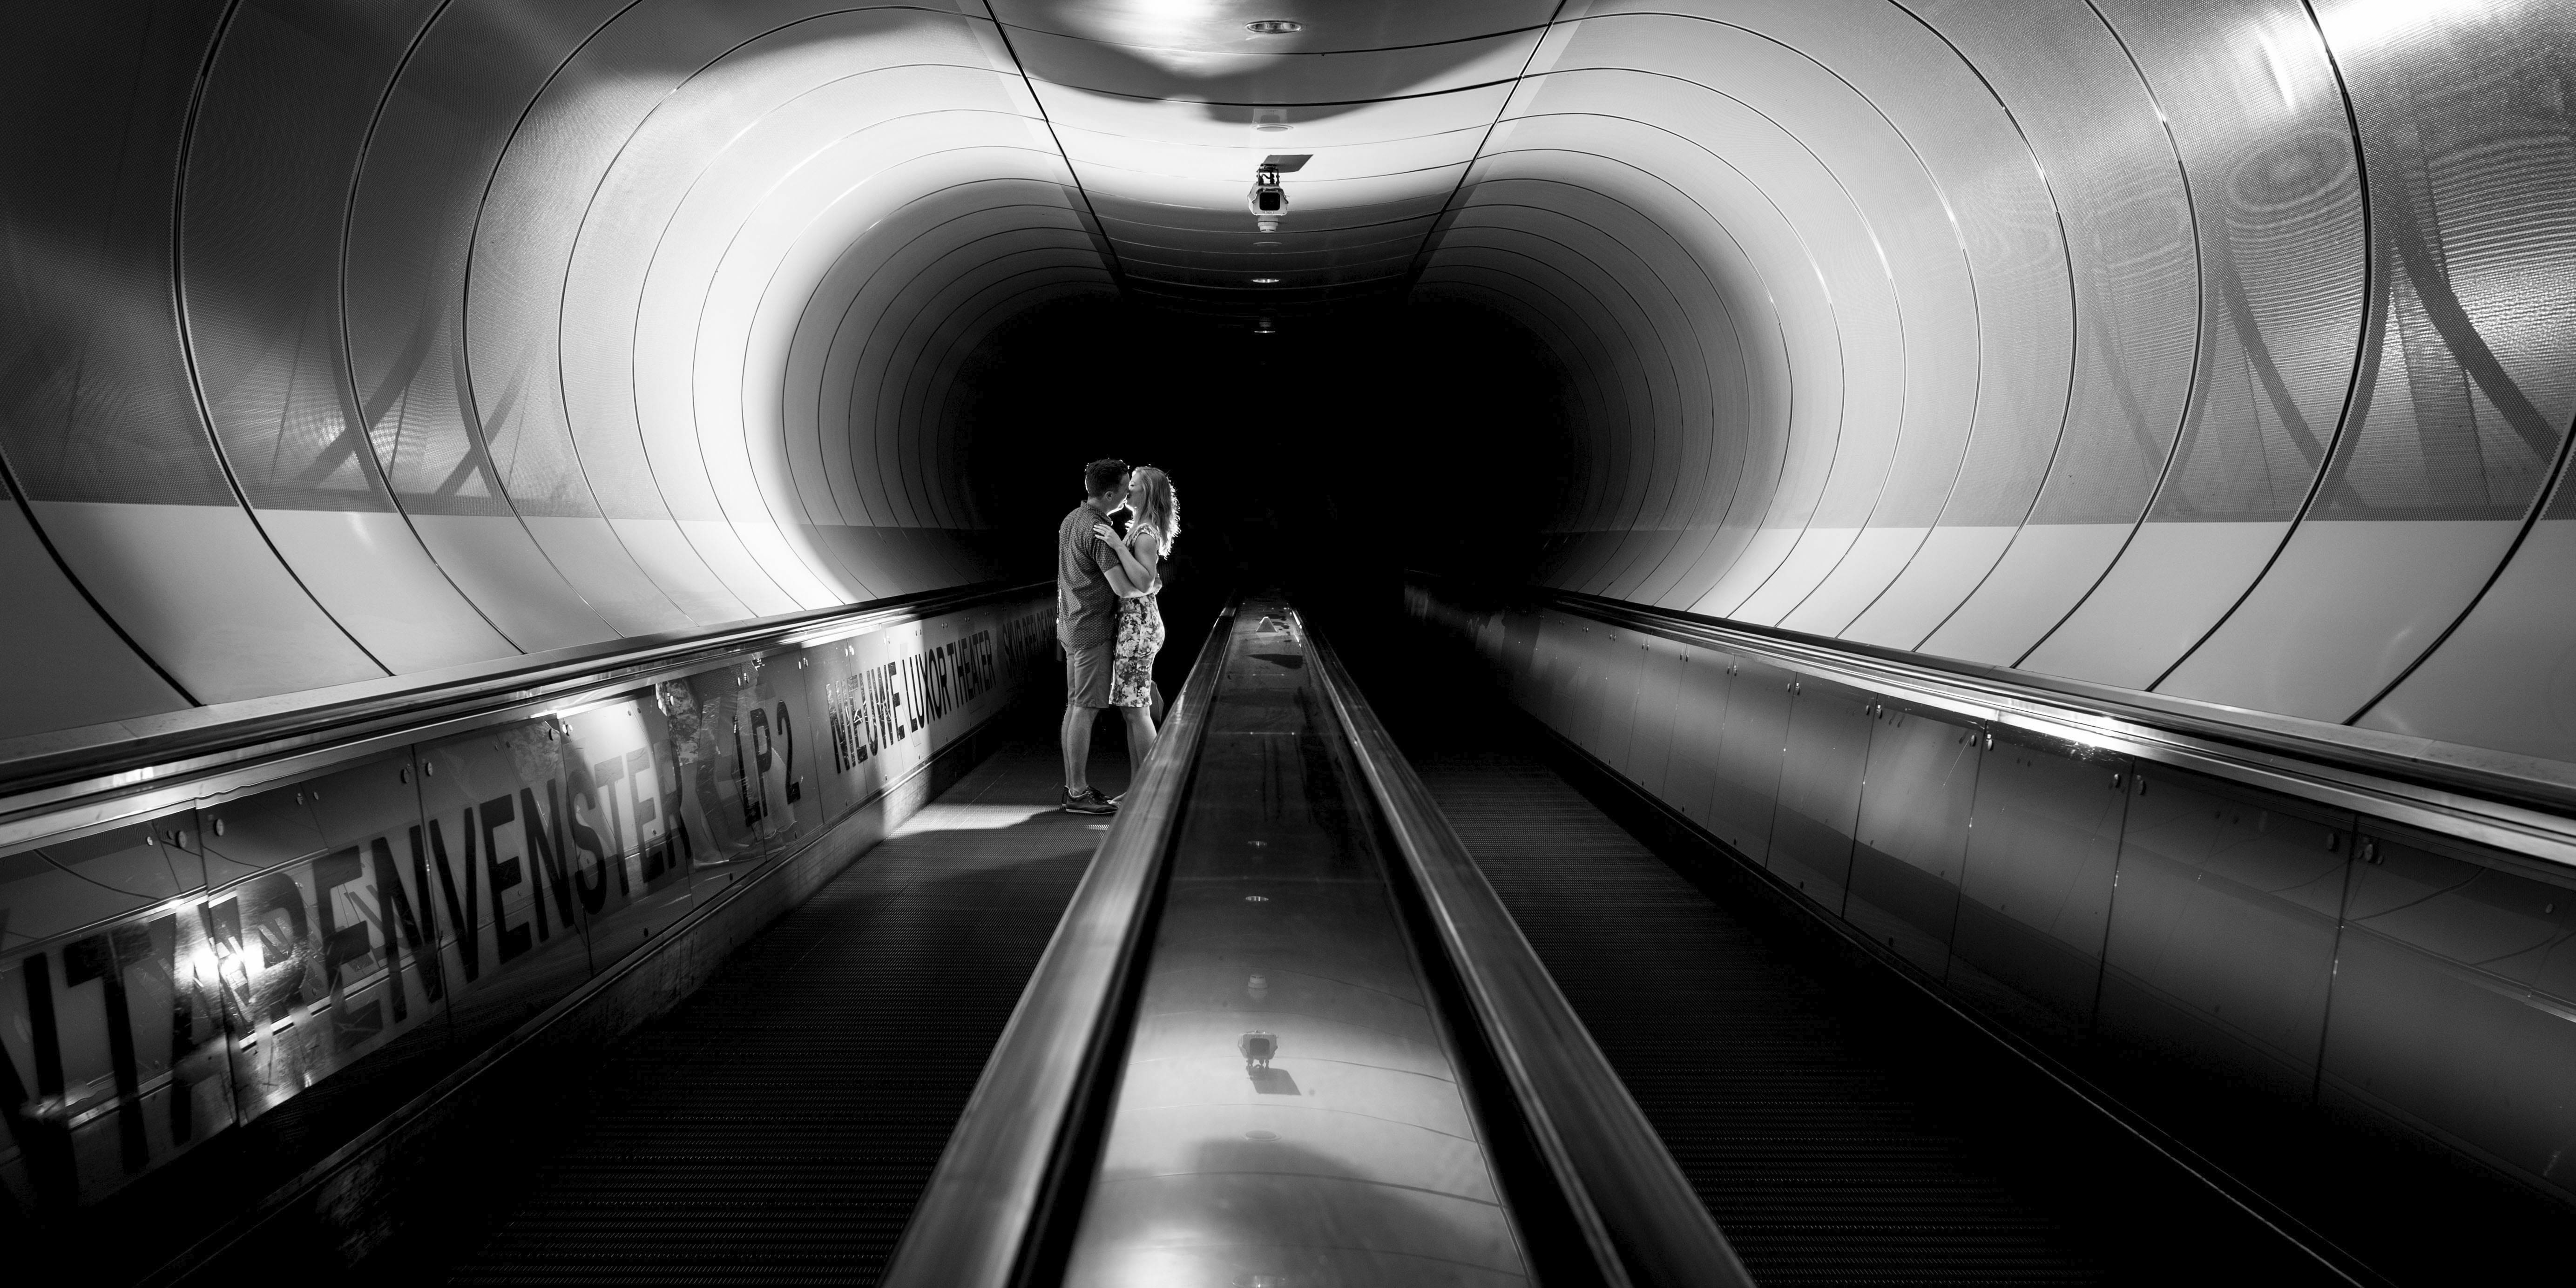 Loveshoot-metro-Rotterdam-TrouwenmetThomas